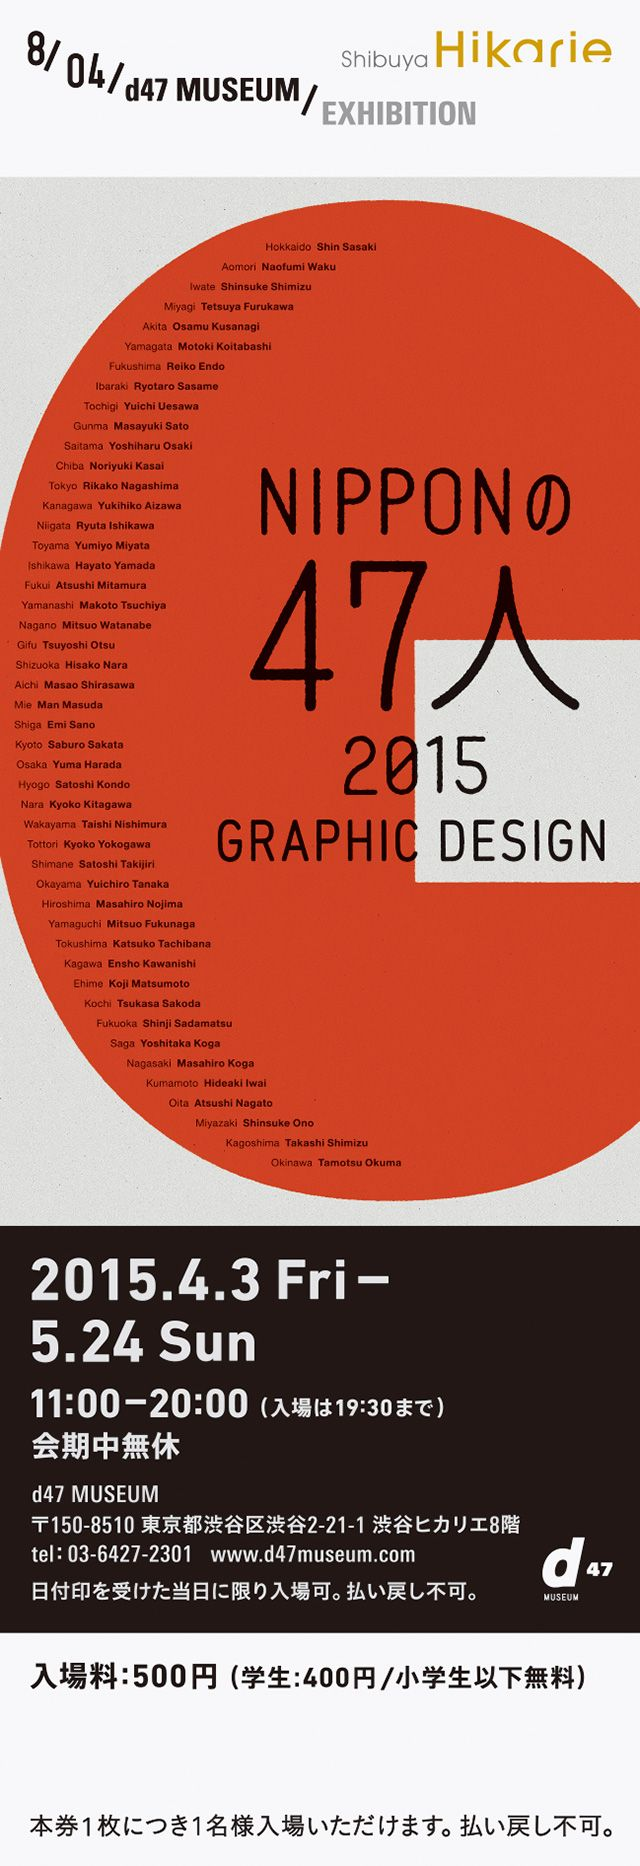 NIPPONの47人 2015 GRAPHIC DESIGN | Works | D&DESIGN